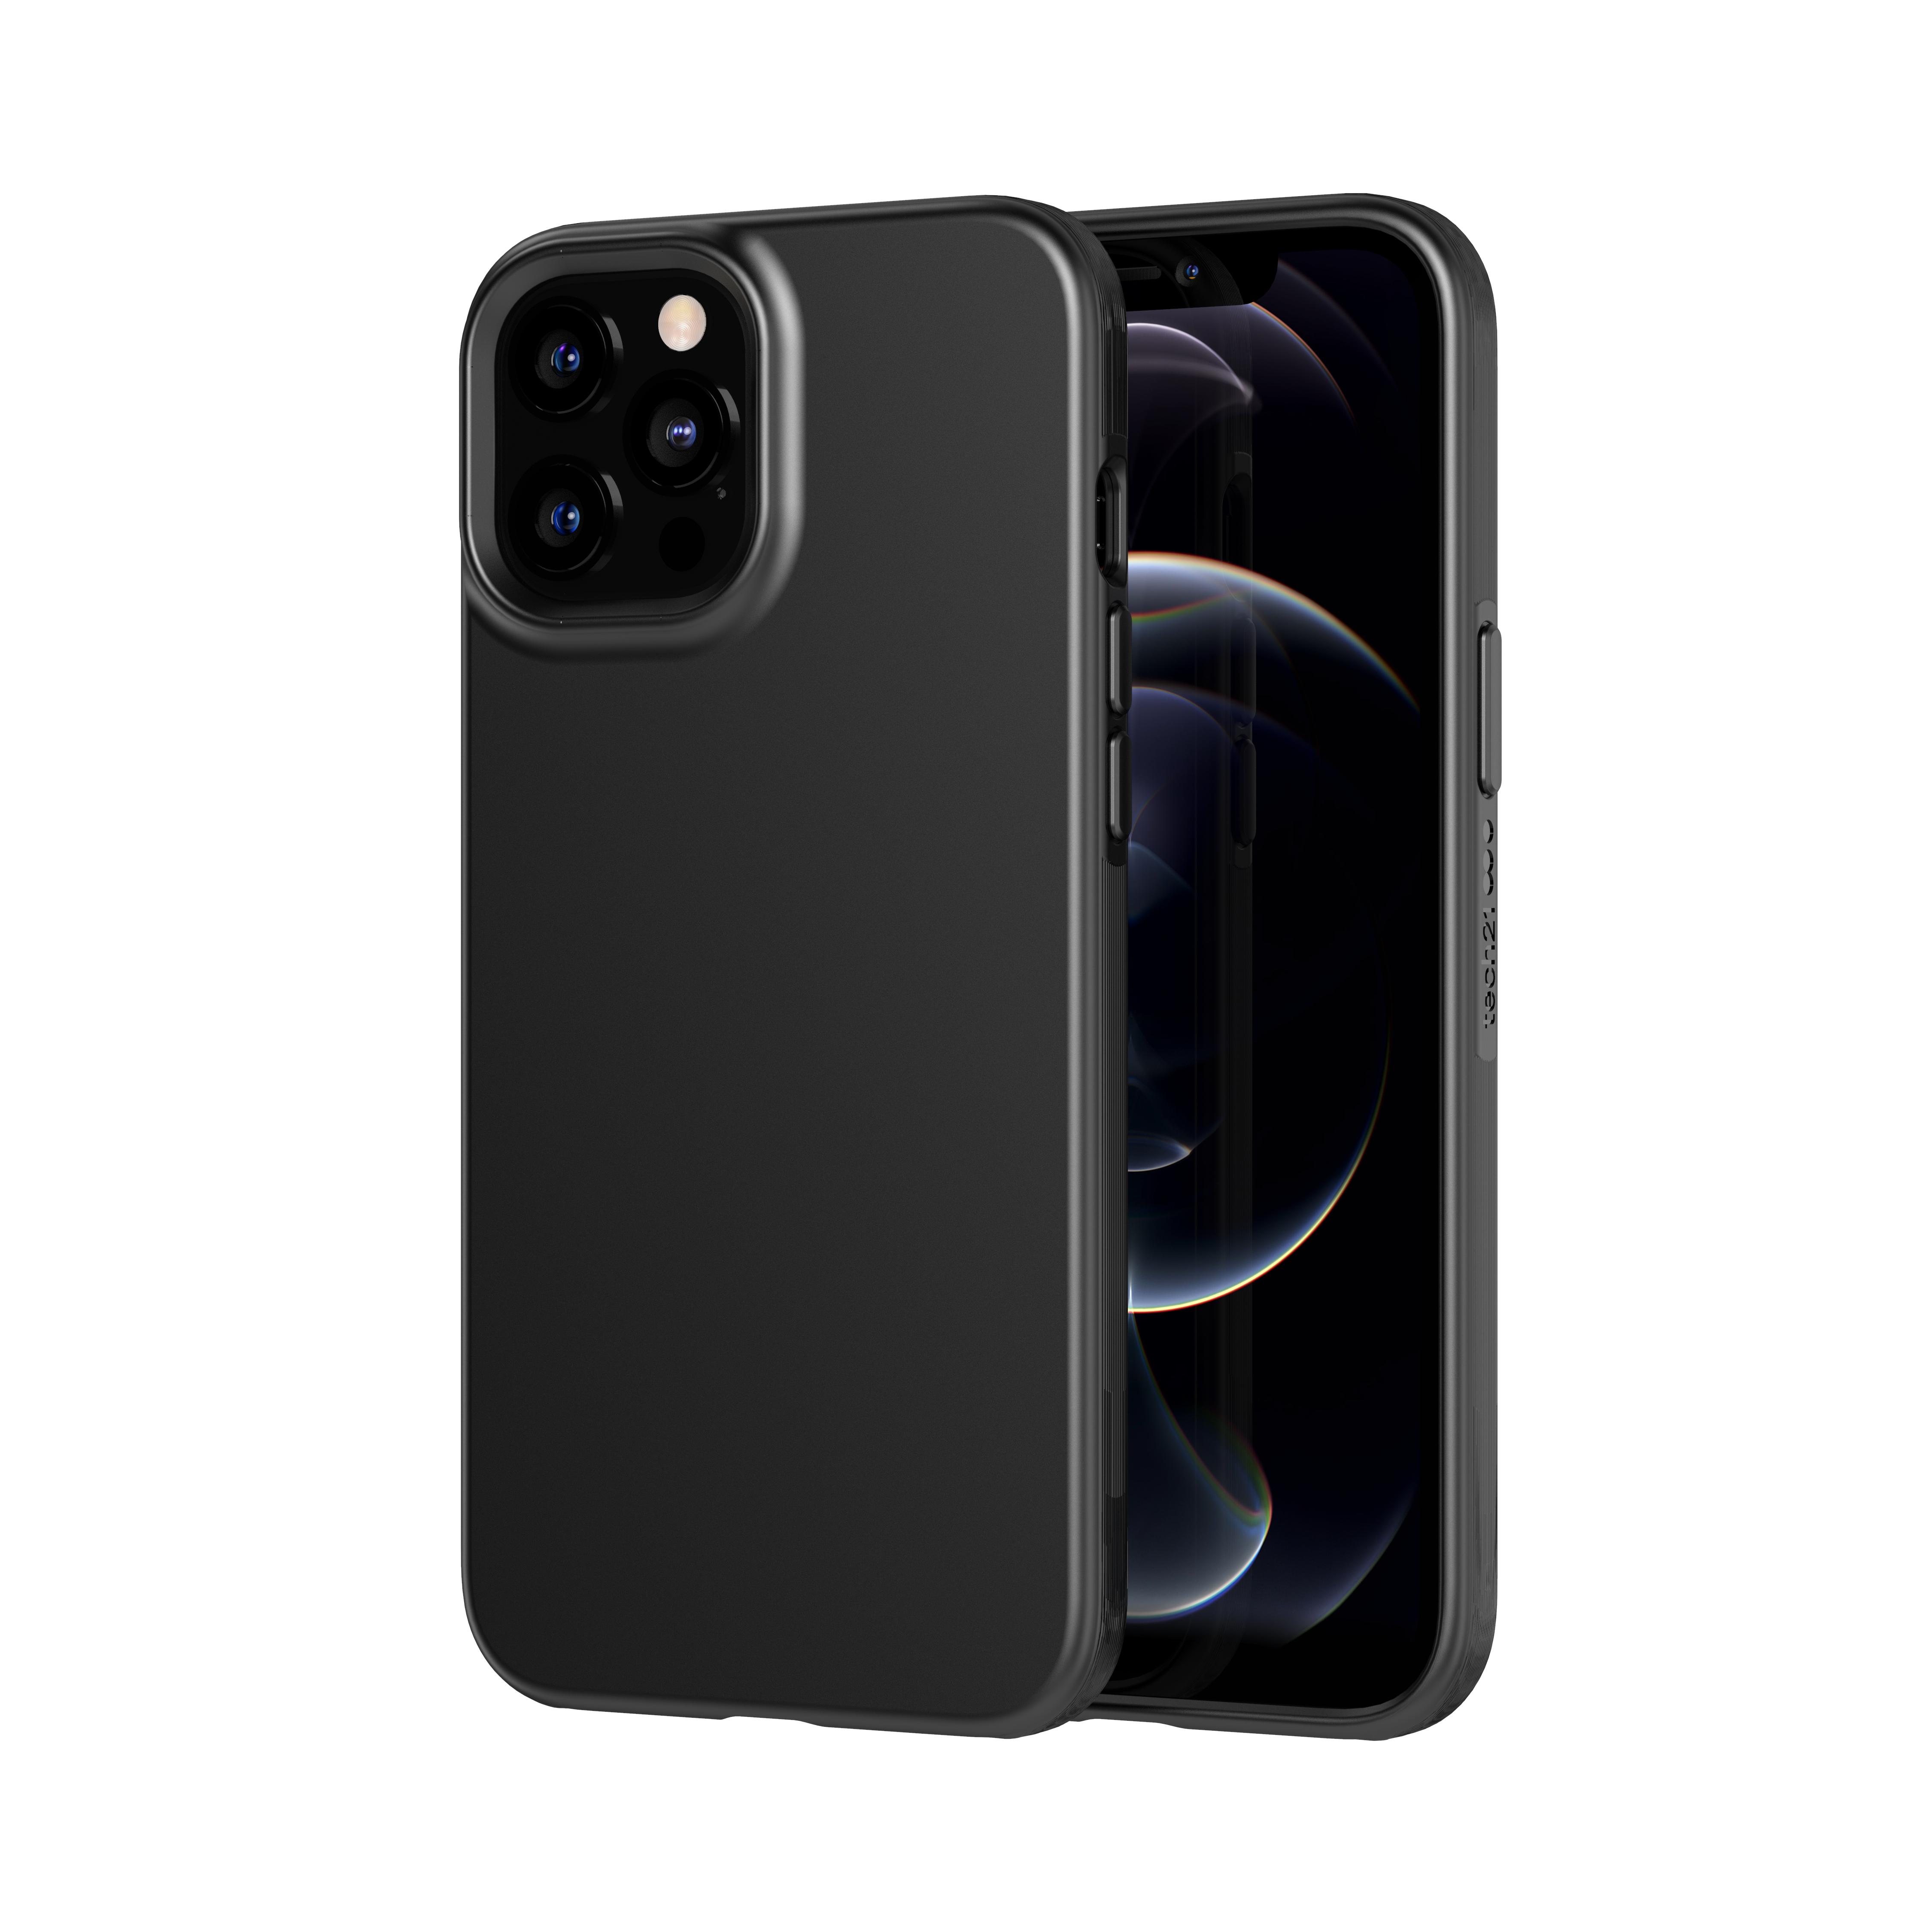 Evo Slim Case iPhone 12/12 Pro Charcoal Black